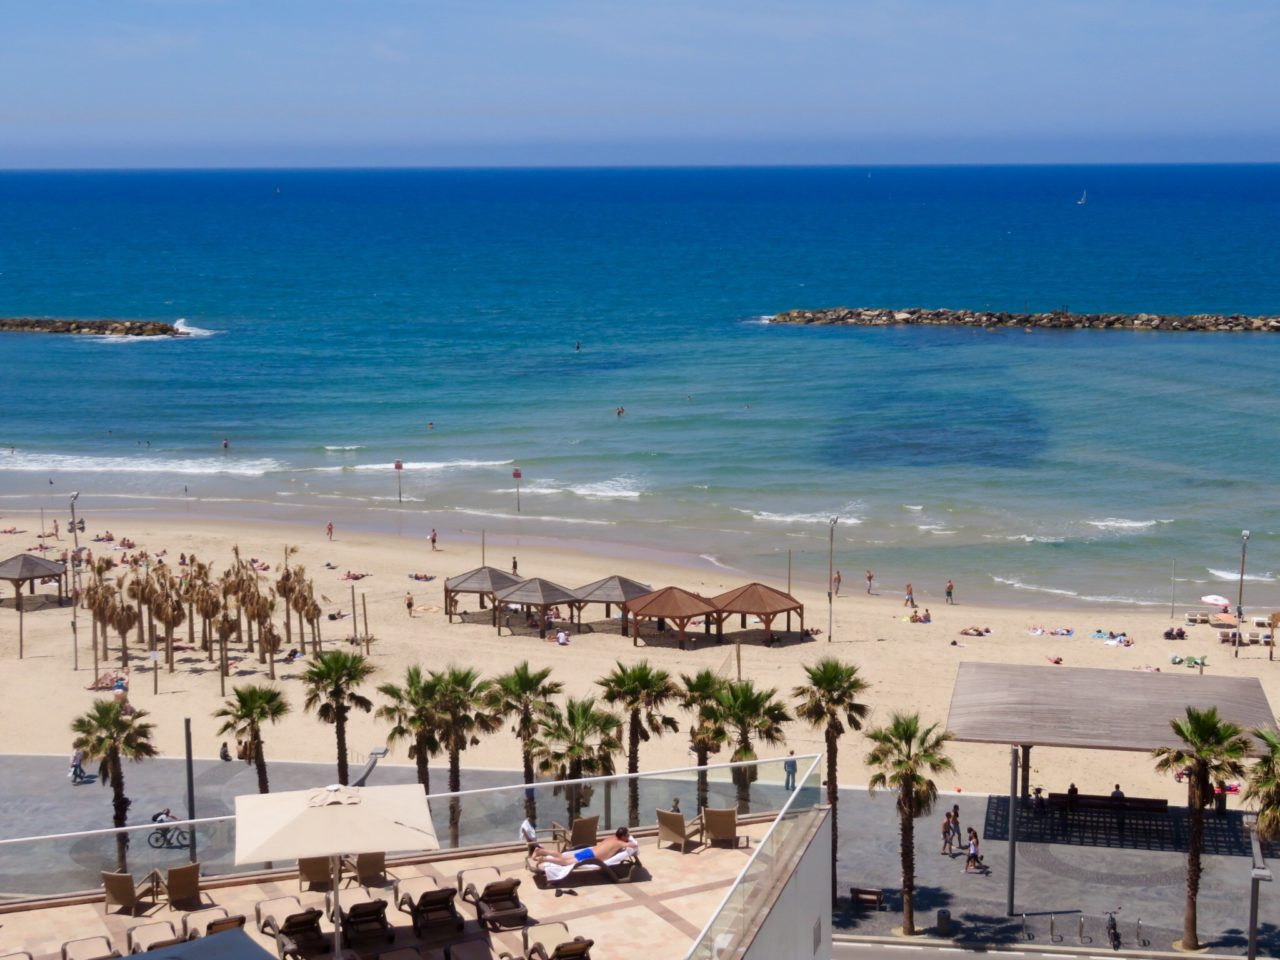 Tel Aviv Beach : View of Frishman Beach from our hotel room window